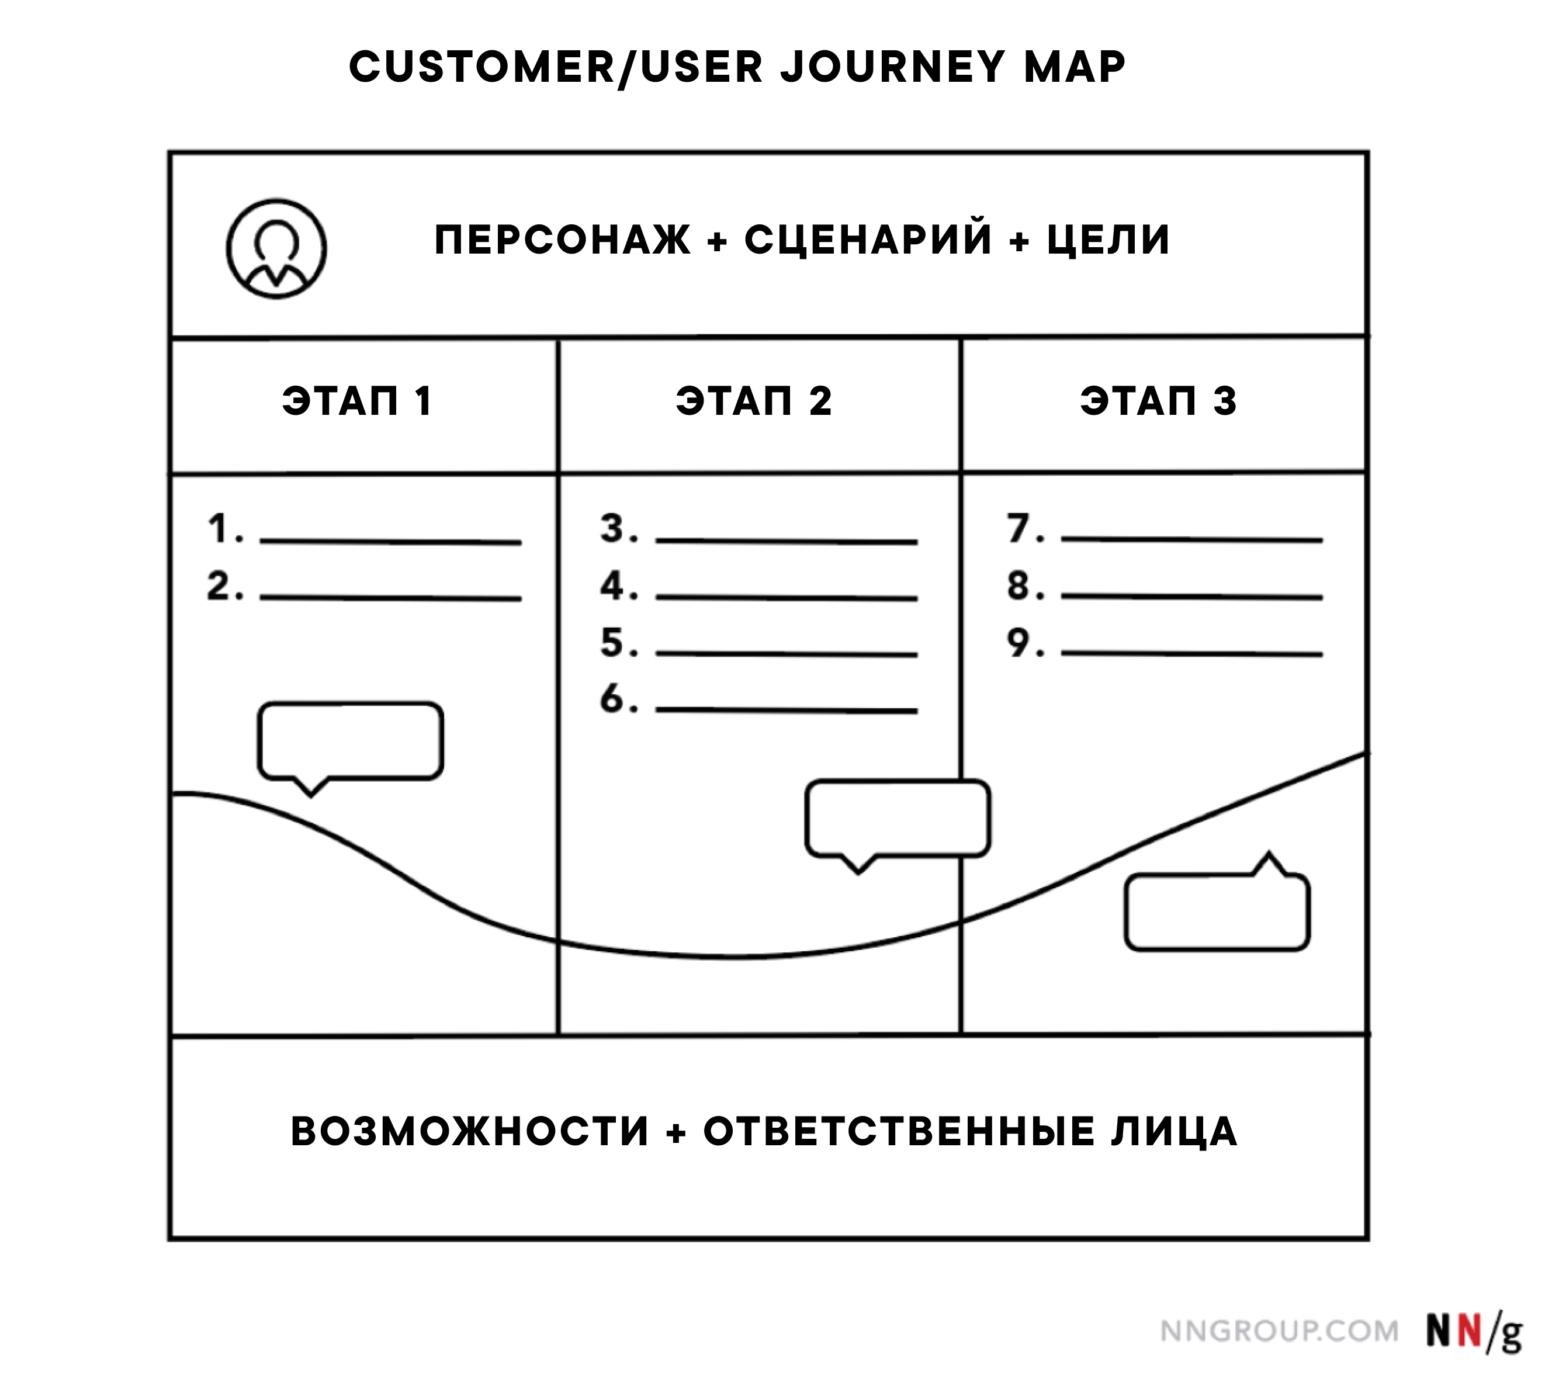 Шаблон Customer Journey Map (CJM) на русском.